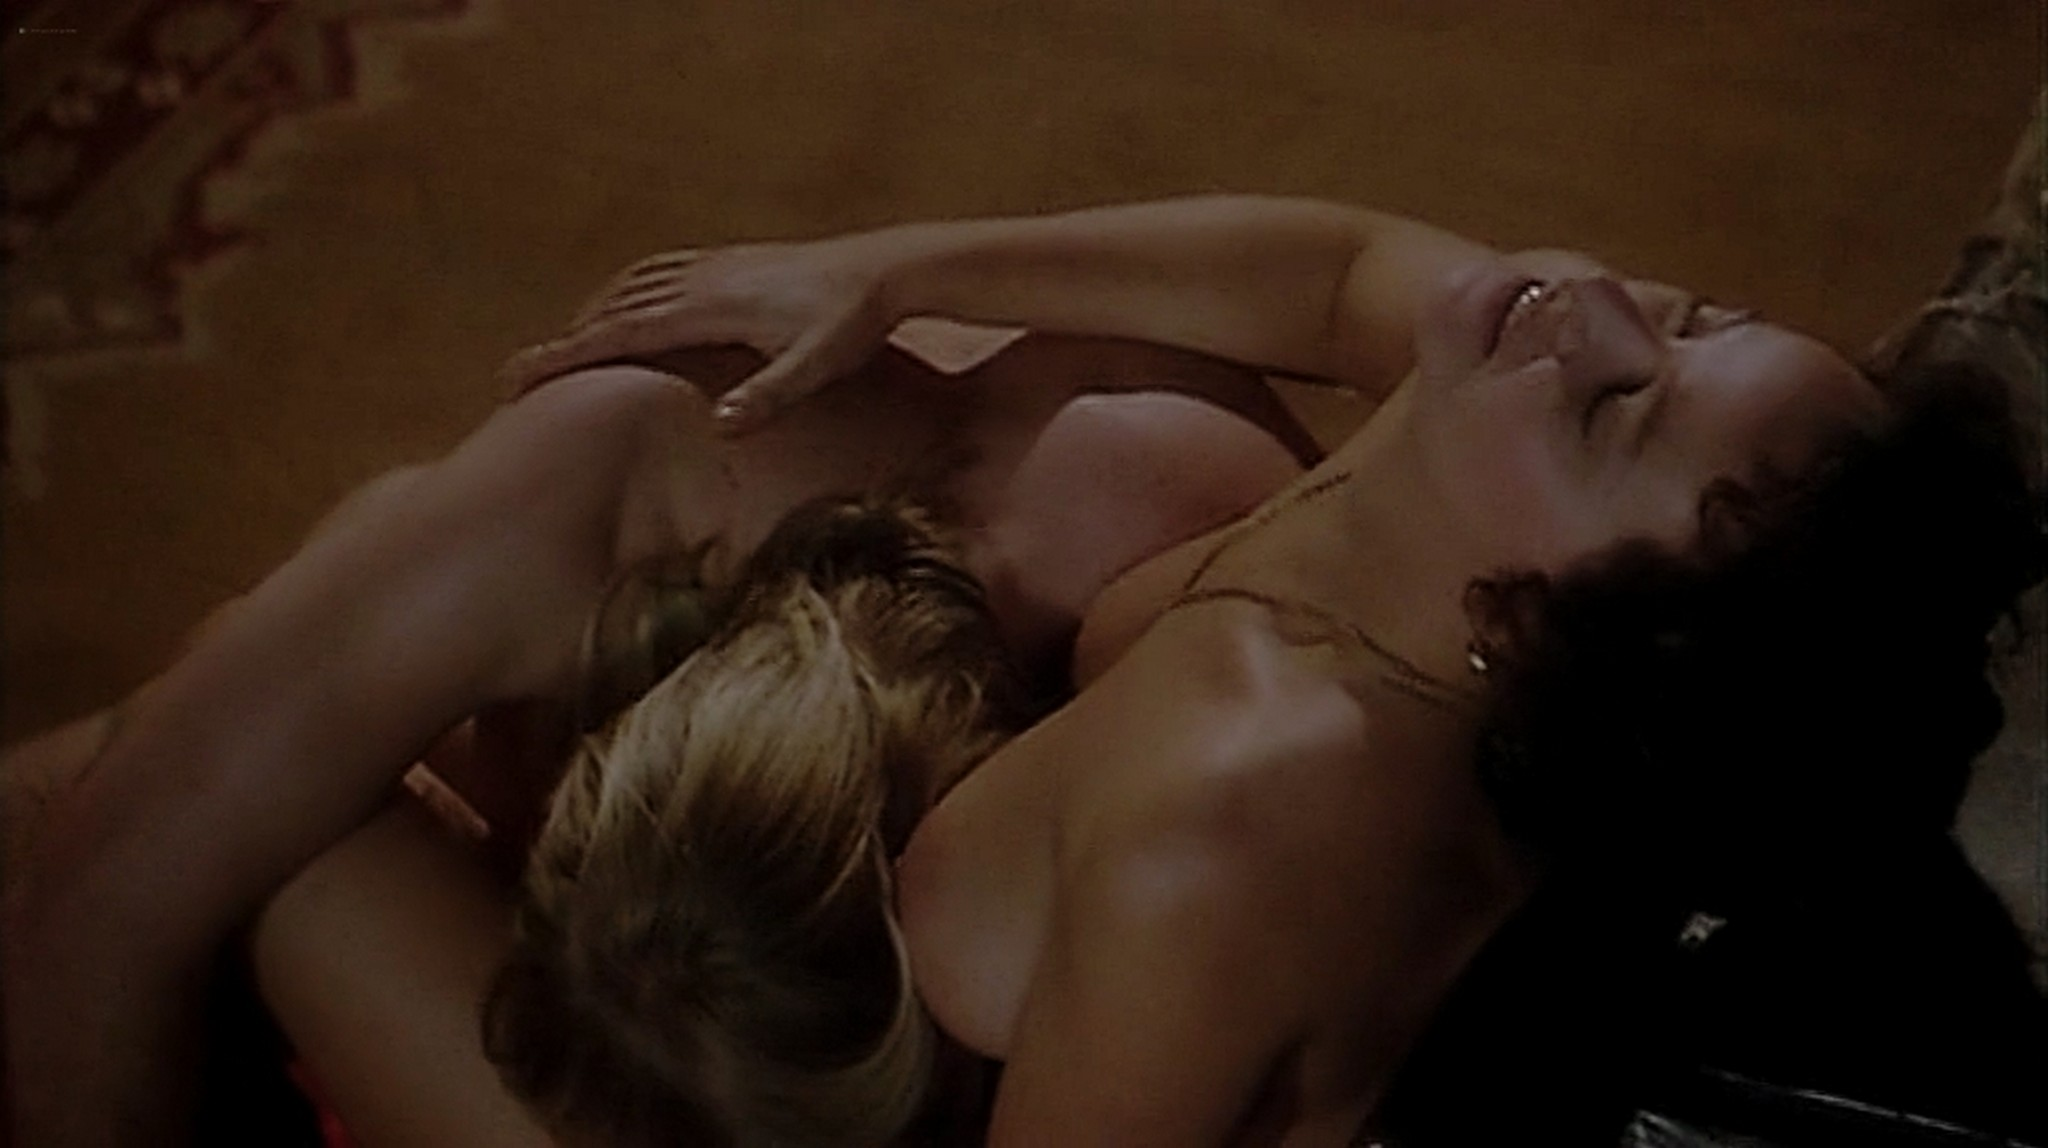 Laura Antonelli nude topless and sex Monica Guerritore nude topless and Clelia Rondinella nude lesbian sex La Venexiana 1986 DVDRip 10